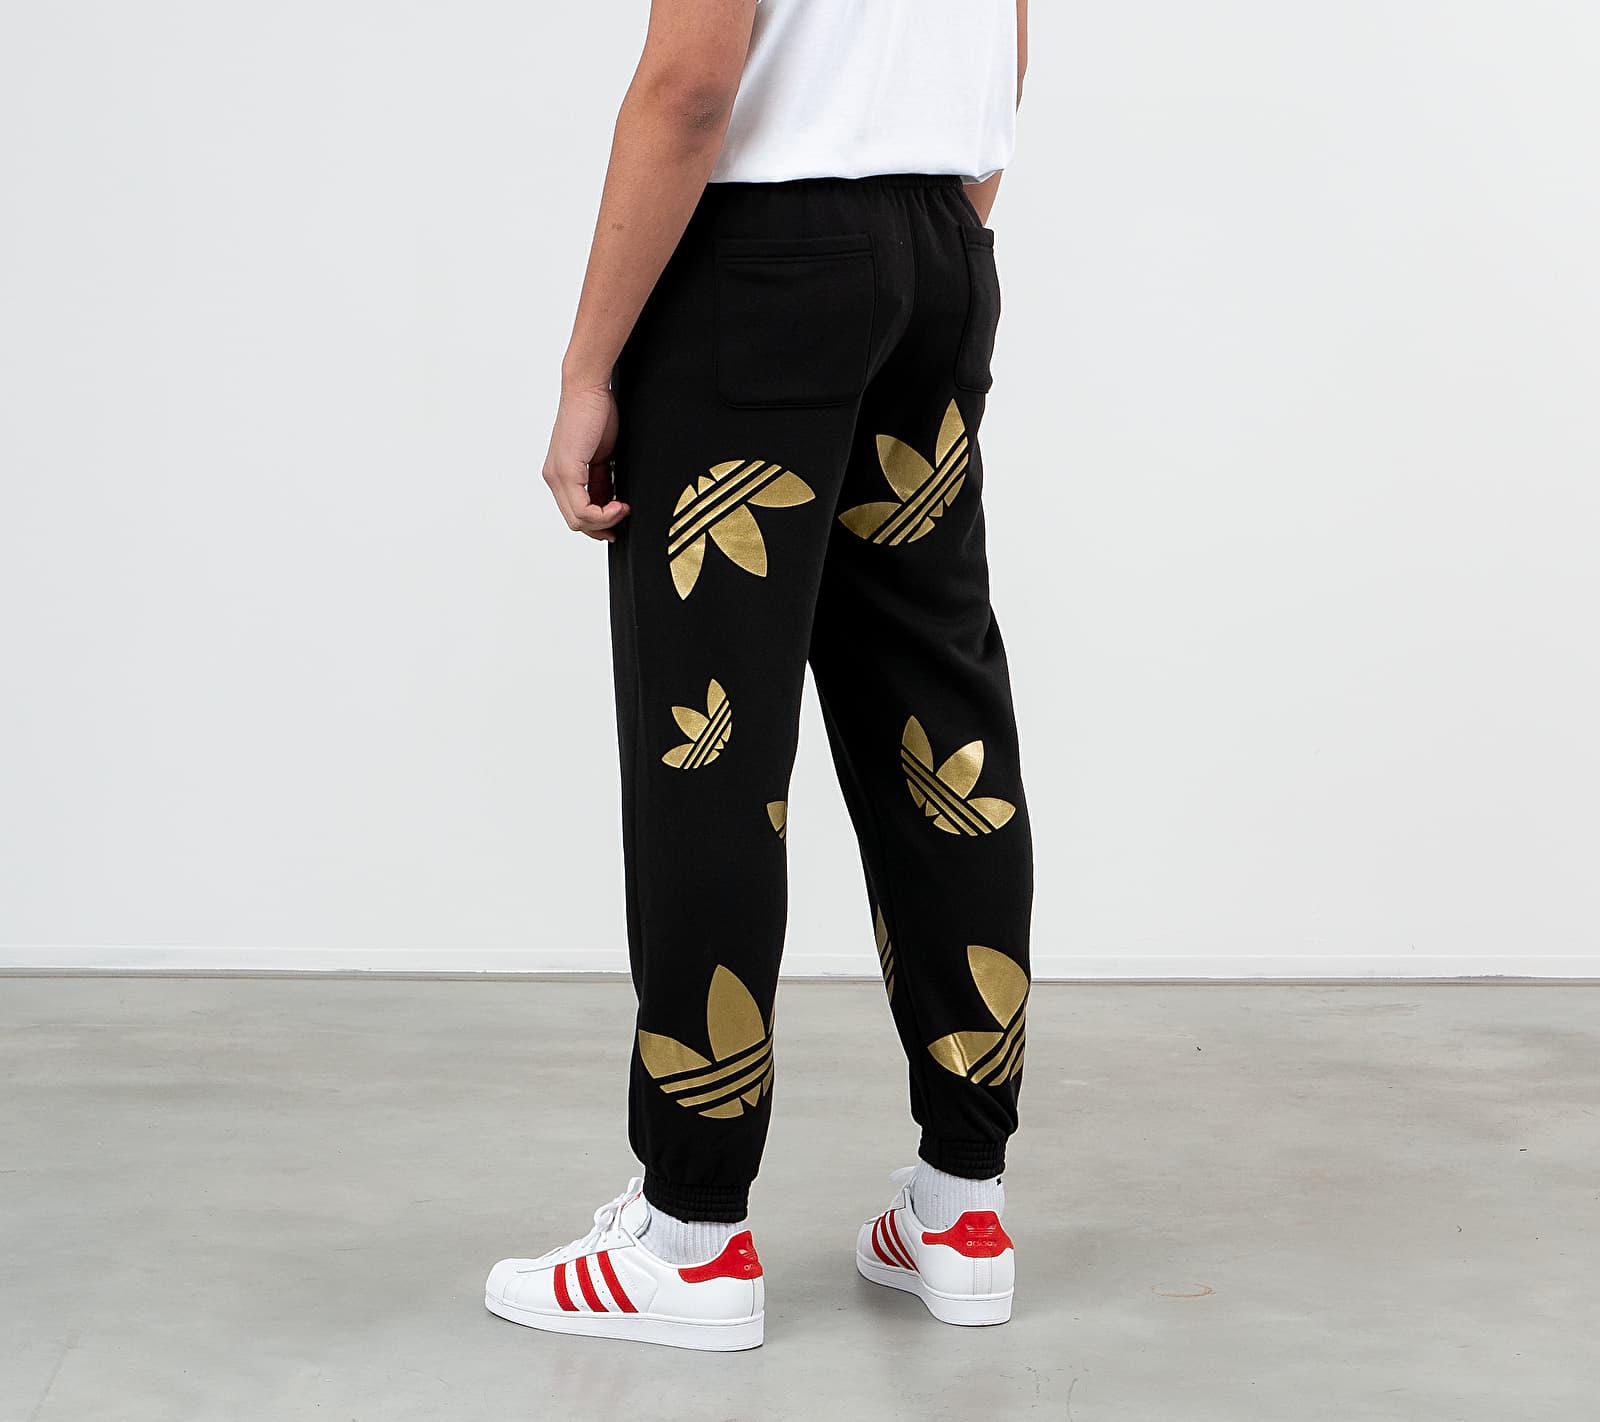 adidas Reflective/ Metallic Pants Black/ Platin Metallic